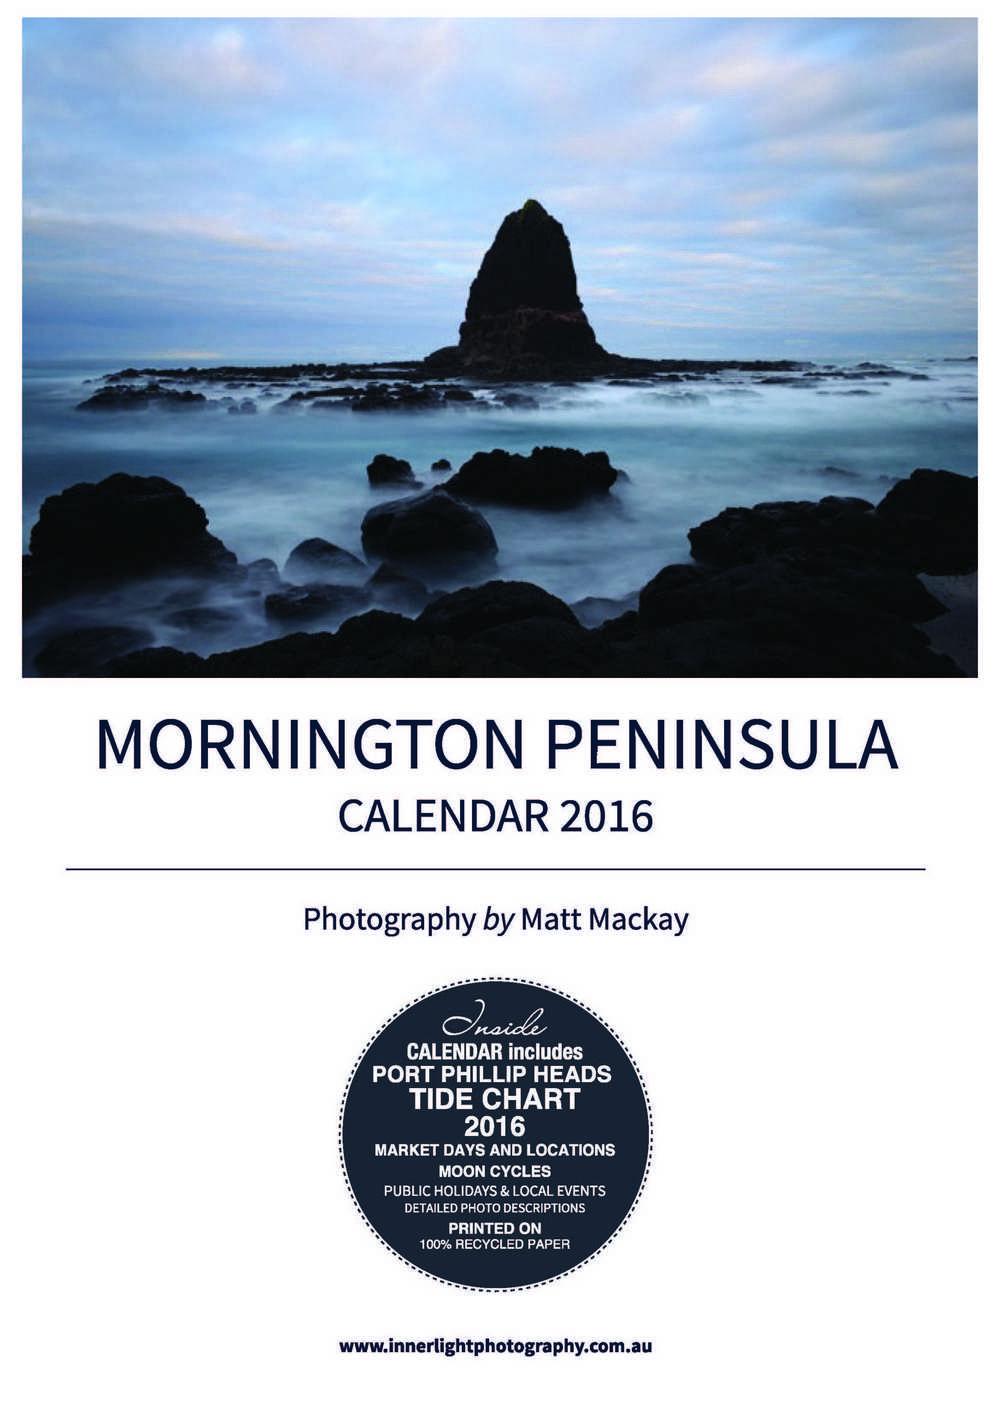 MP-calendar-2016-cover